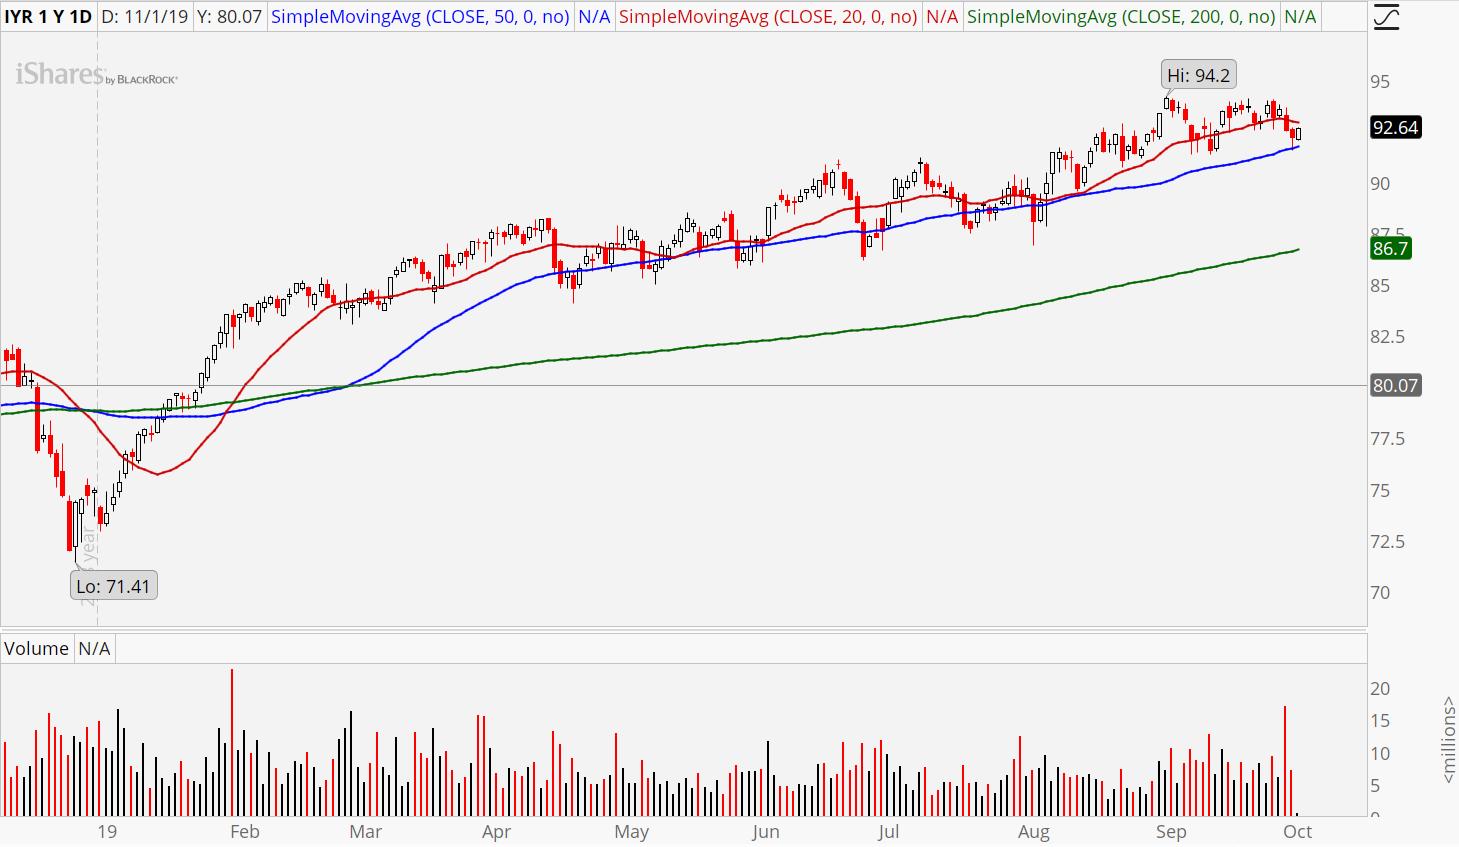 3 Safe Stocks to Buy: iShares US Real Estate ETF (IYR)